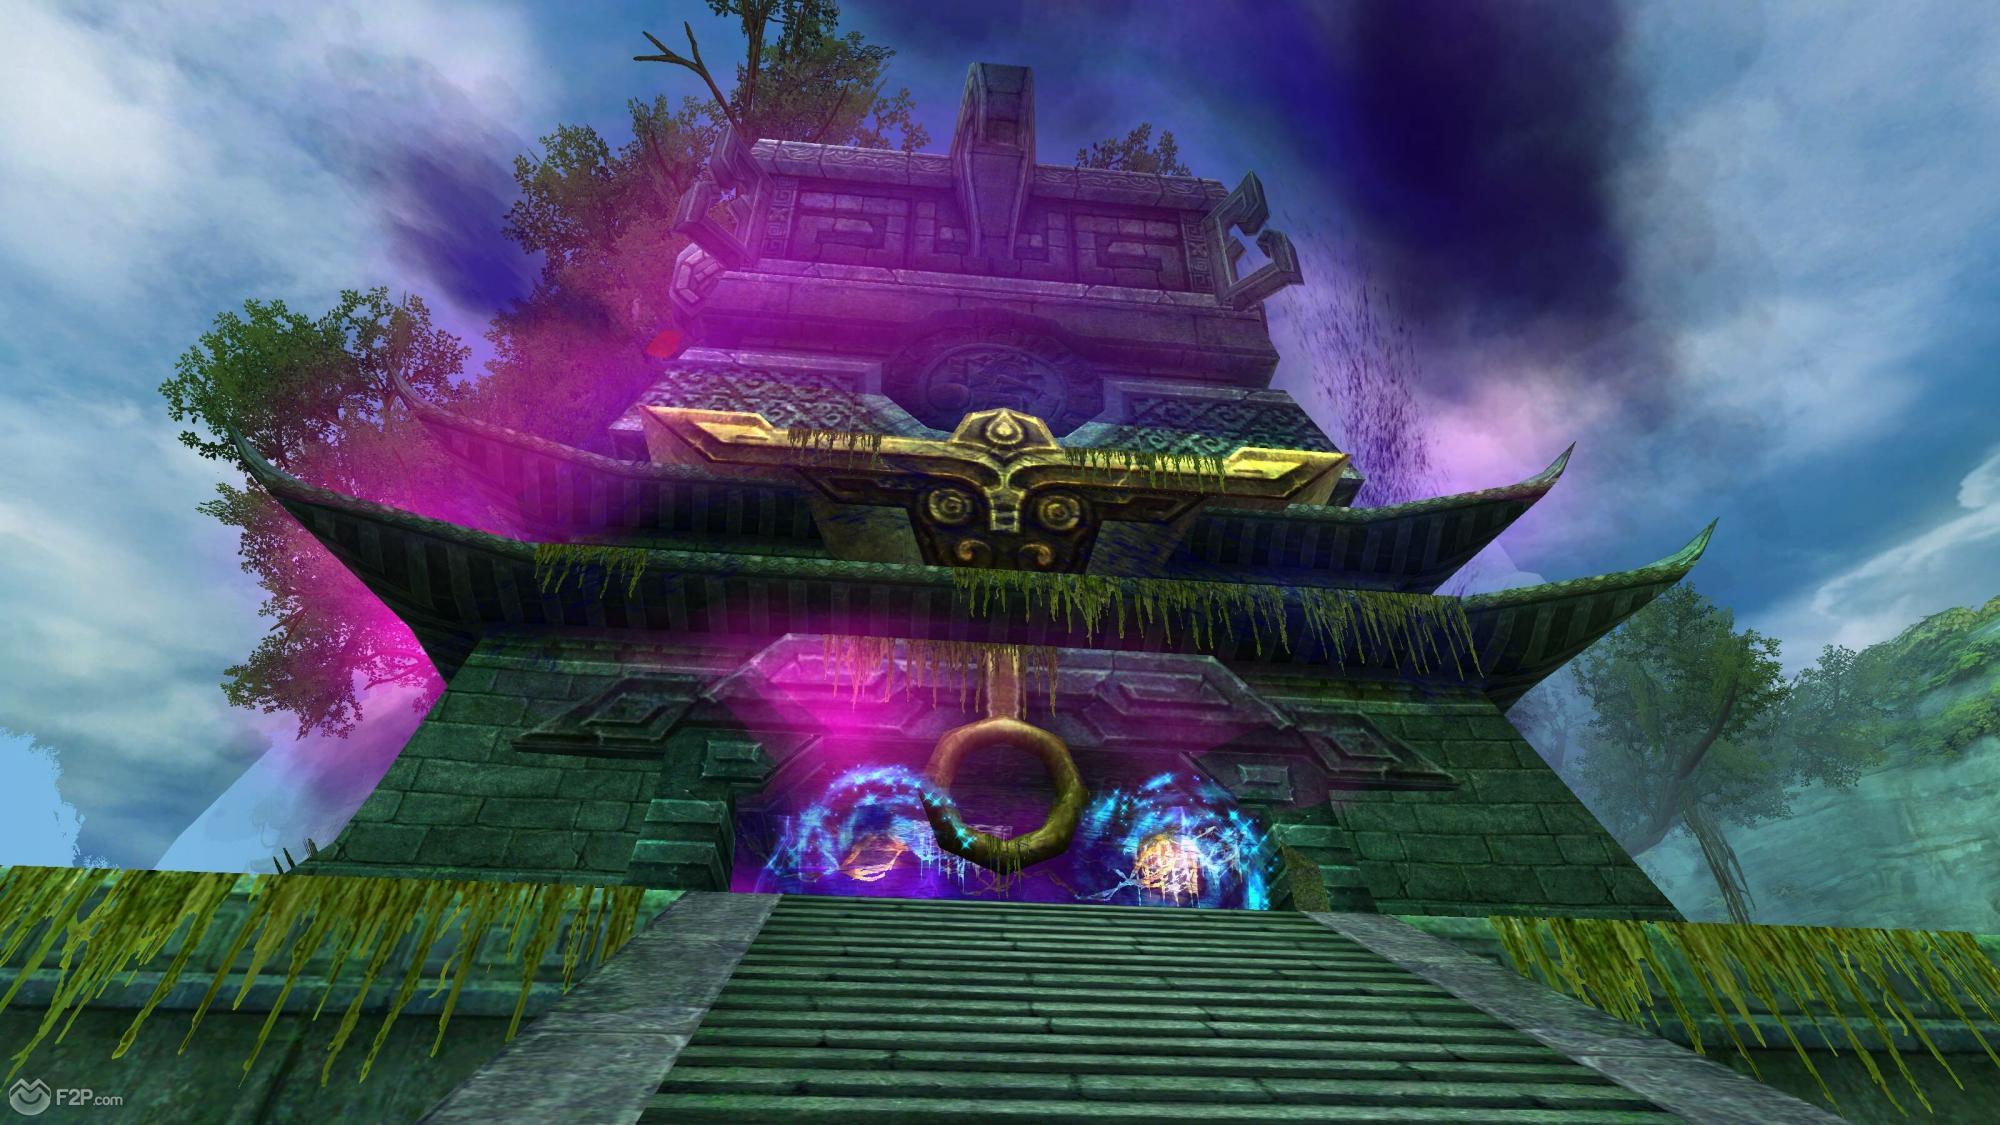 Click image for larger version.Name:Jade Dynasty 97.jpgViews:229Size:284.5 KBID:6059